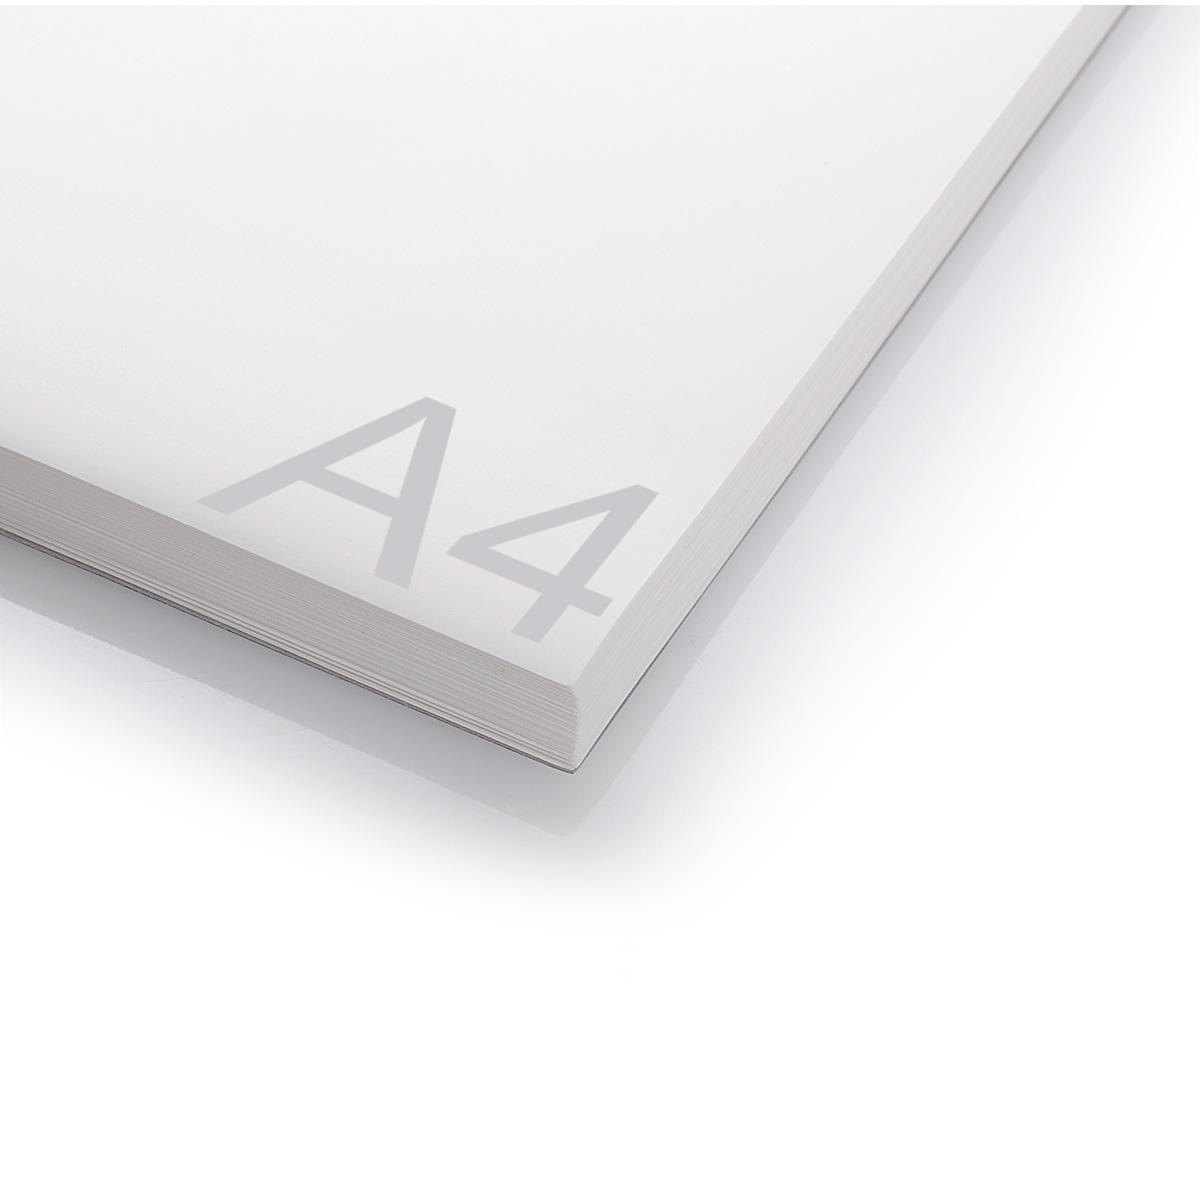 A4 Inkjet RC Fotopapier | PREMIUM | Satin | 260SM | 20 Blatt